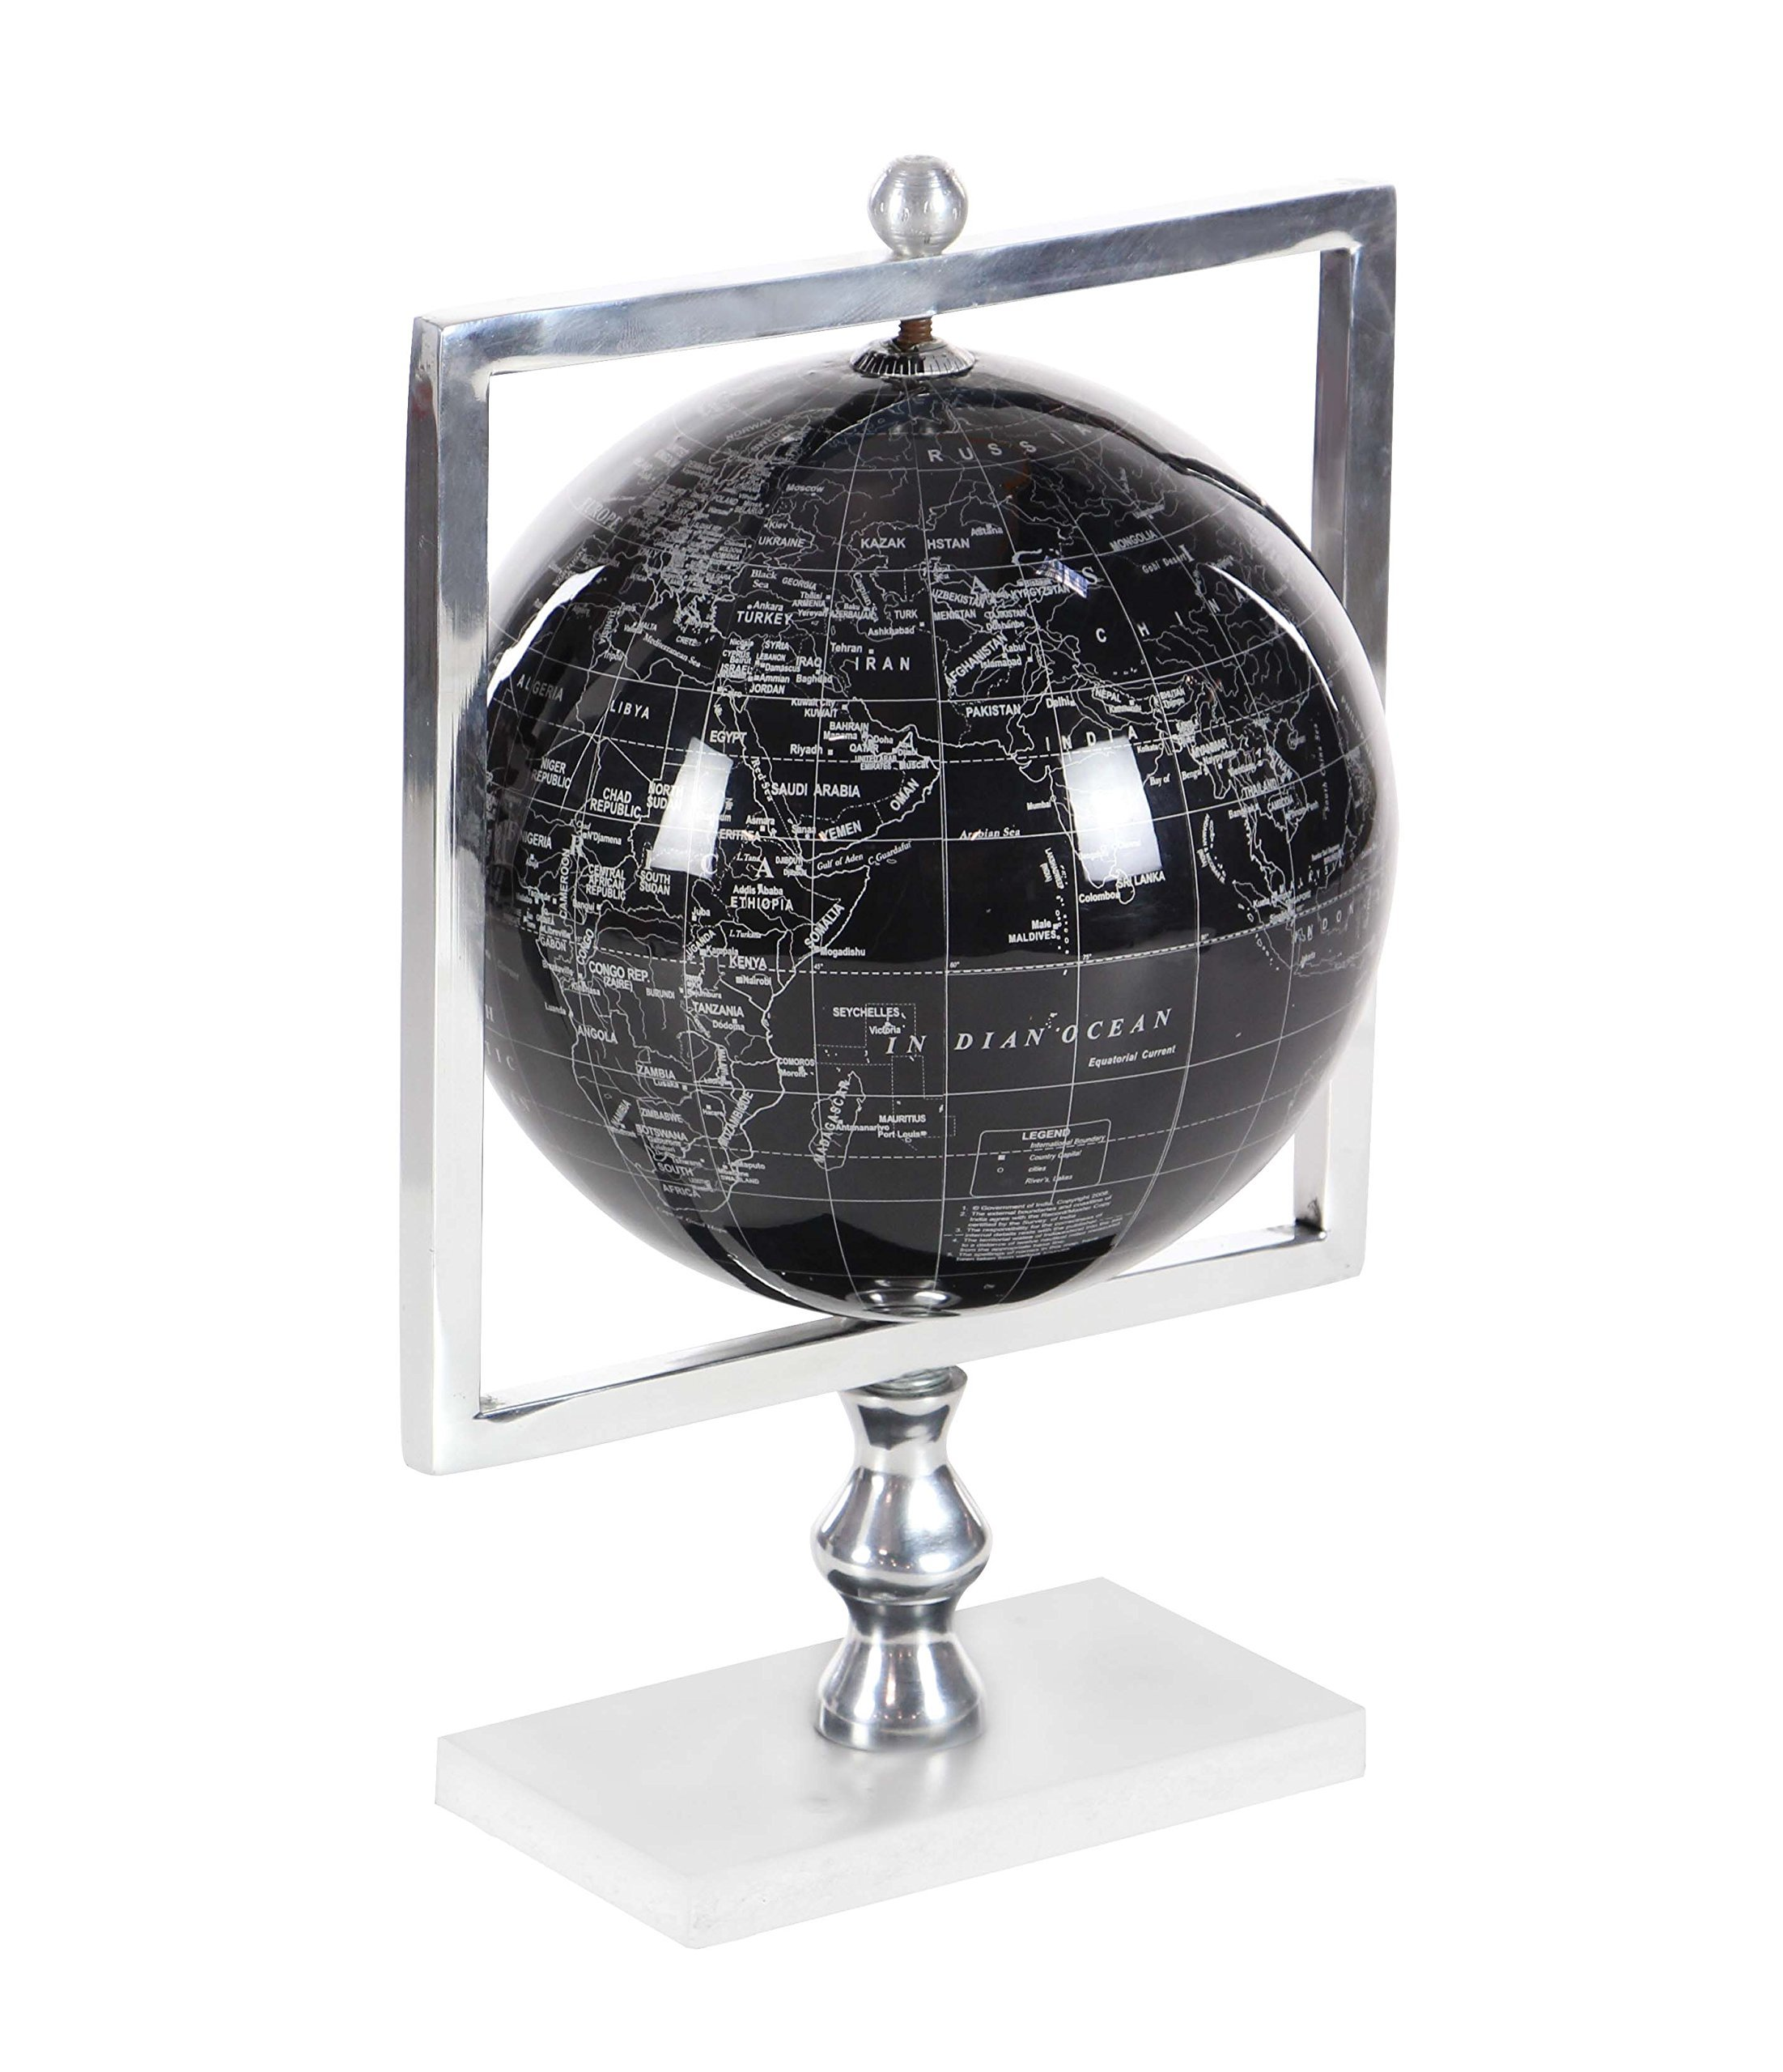 Deco 79 57369 Polished Aluminum, Marble and PVC Decorative Globe, 15'' x 9'', Silver/Black/White